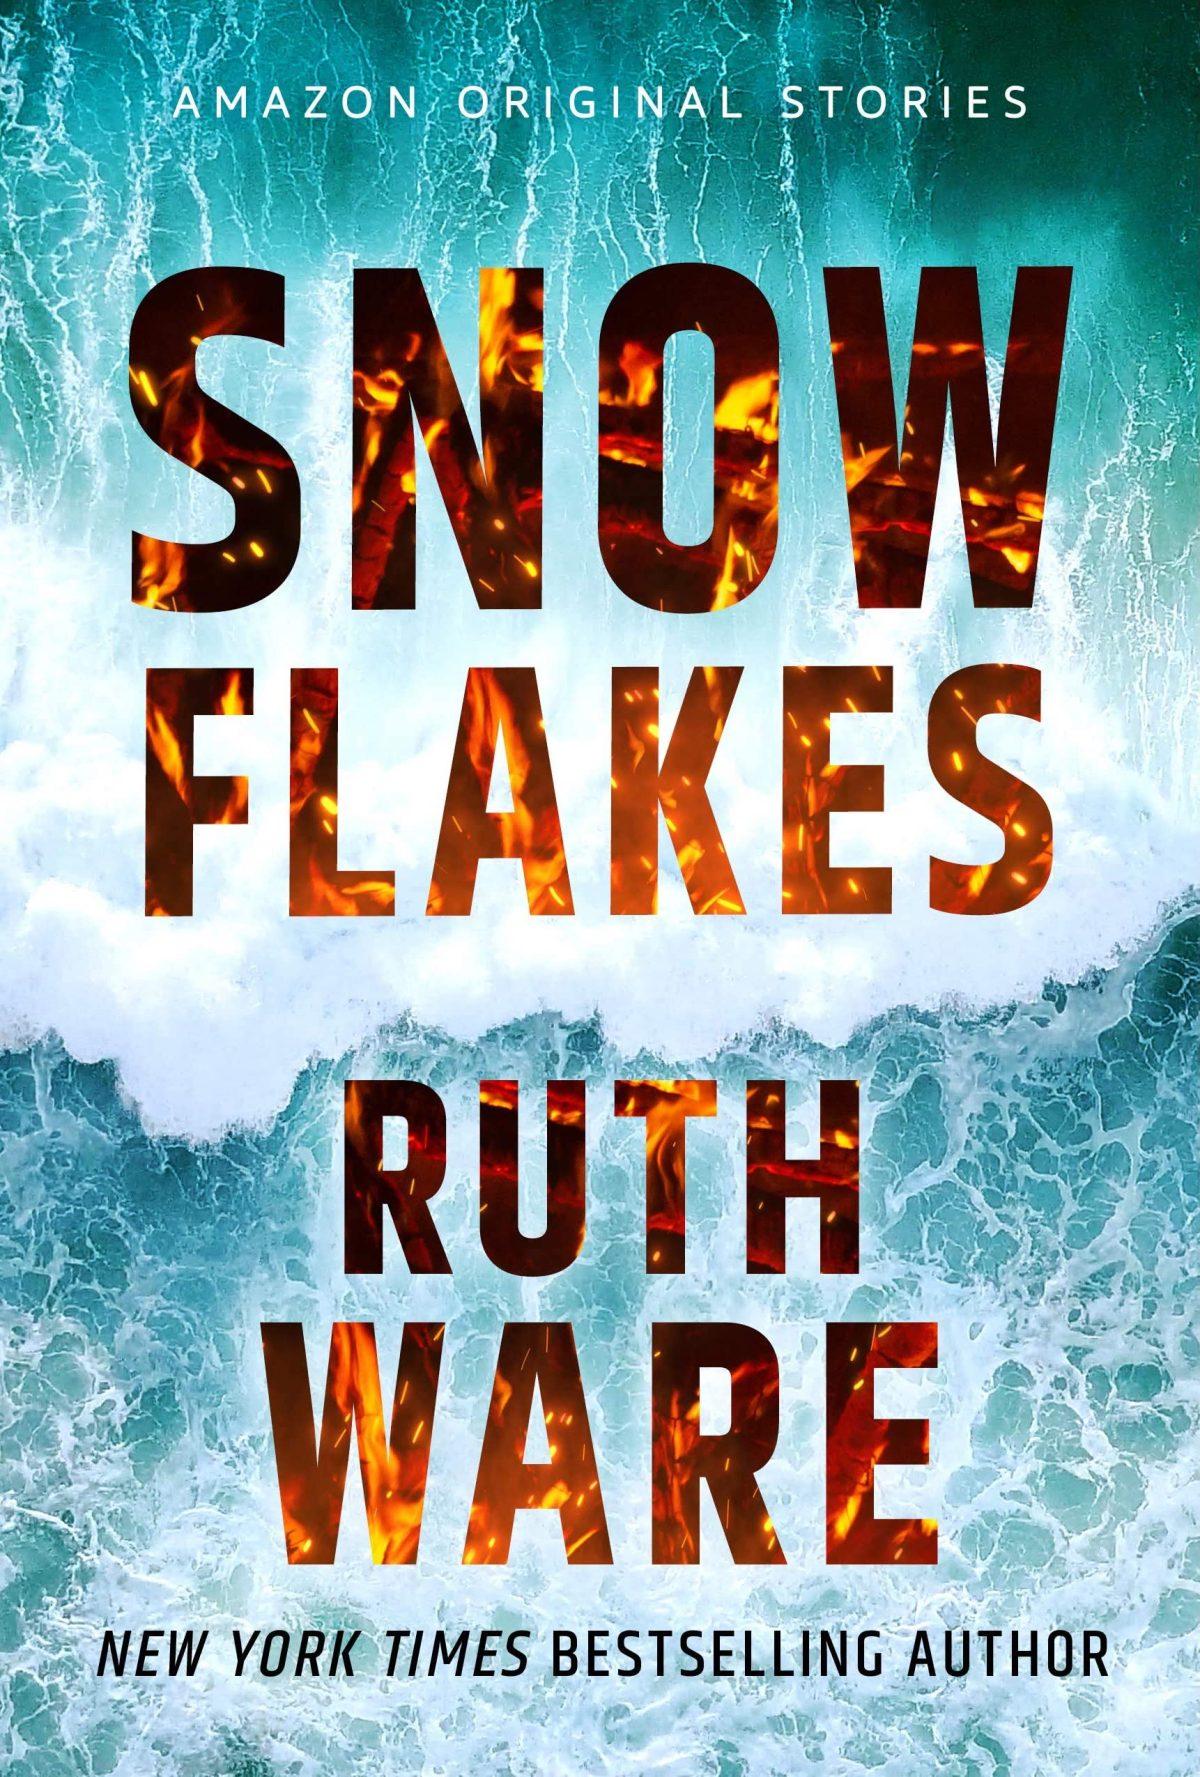 Ruth Ware - Snowflakes